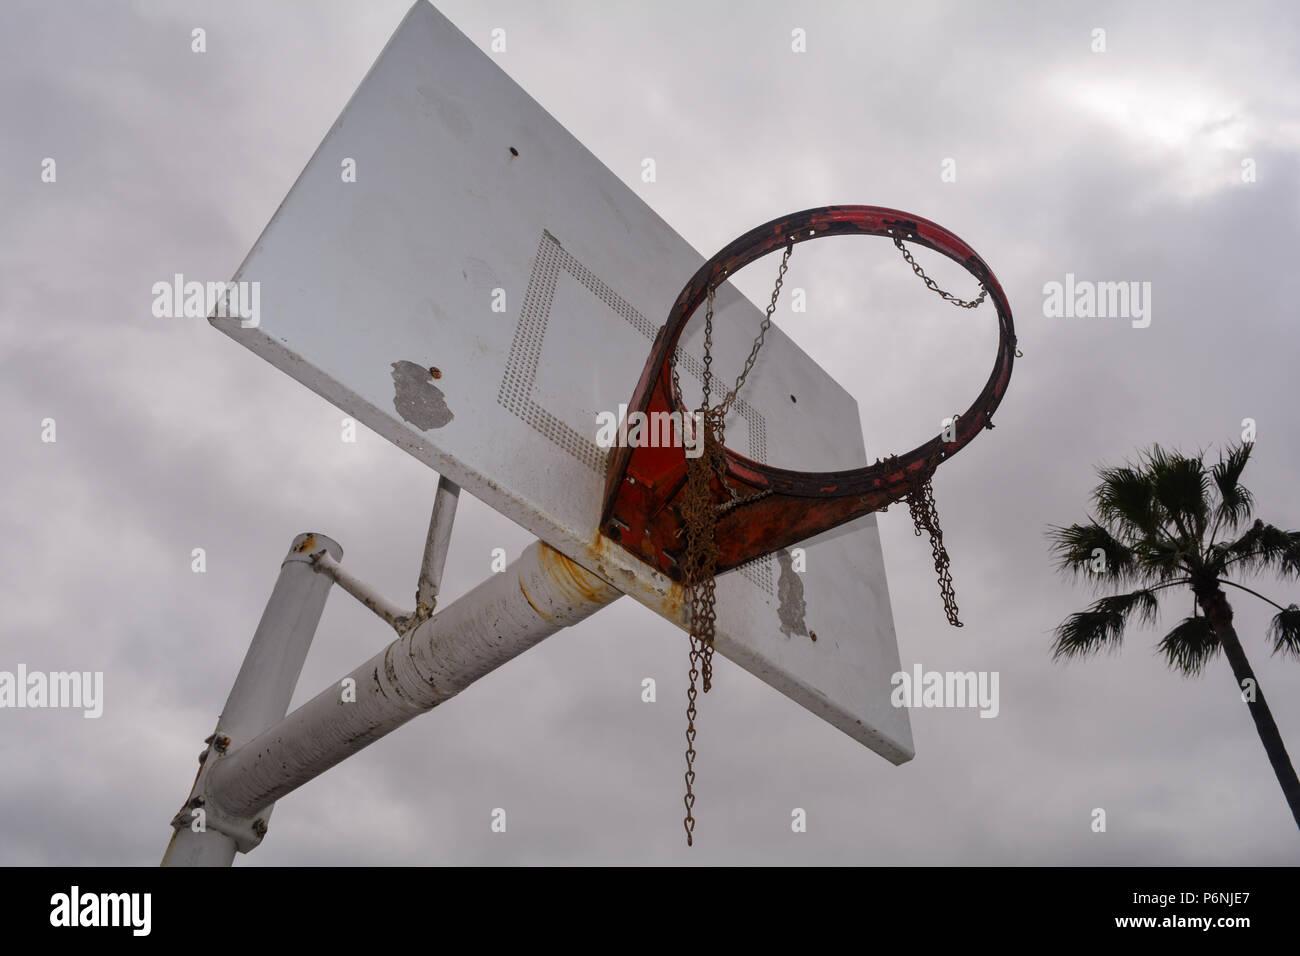 Sad lonely gloomy forgotten sport outdoors depressed mental health public - Stock Image